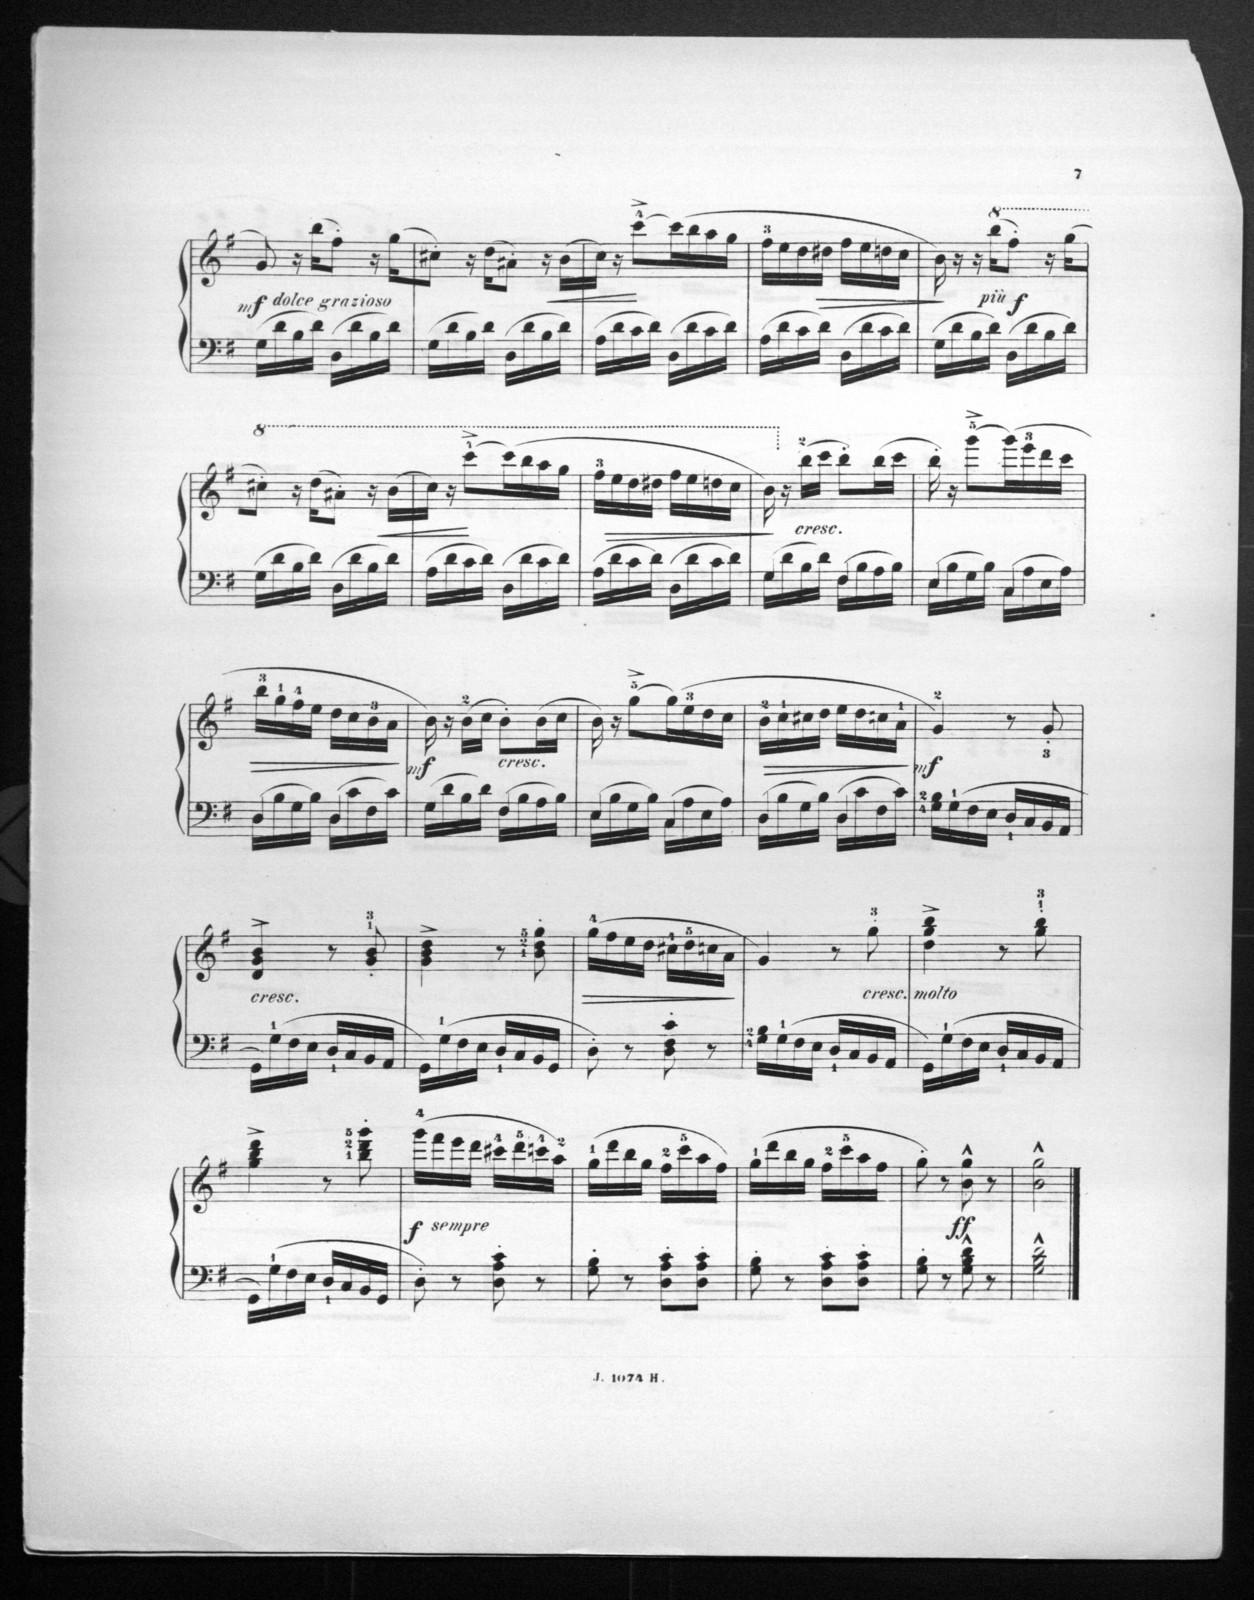 Rondo I, op. 148, no. 1